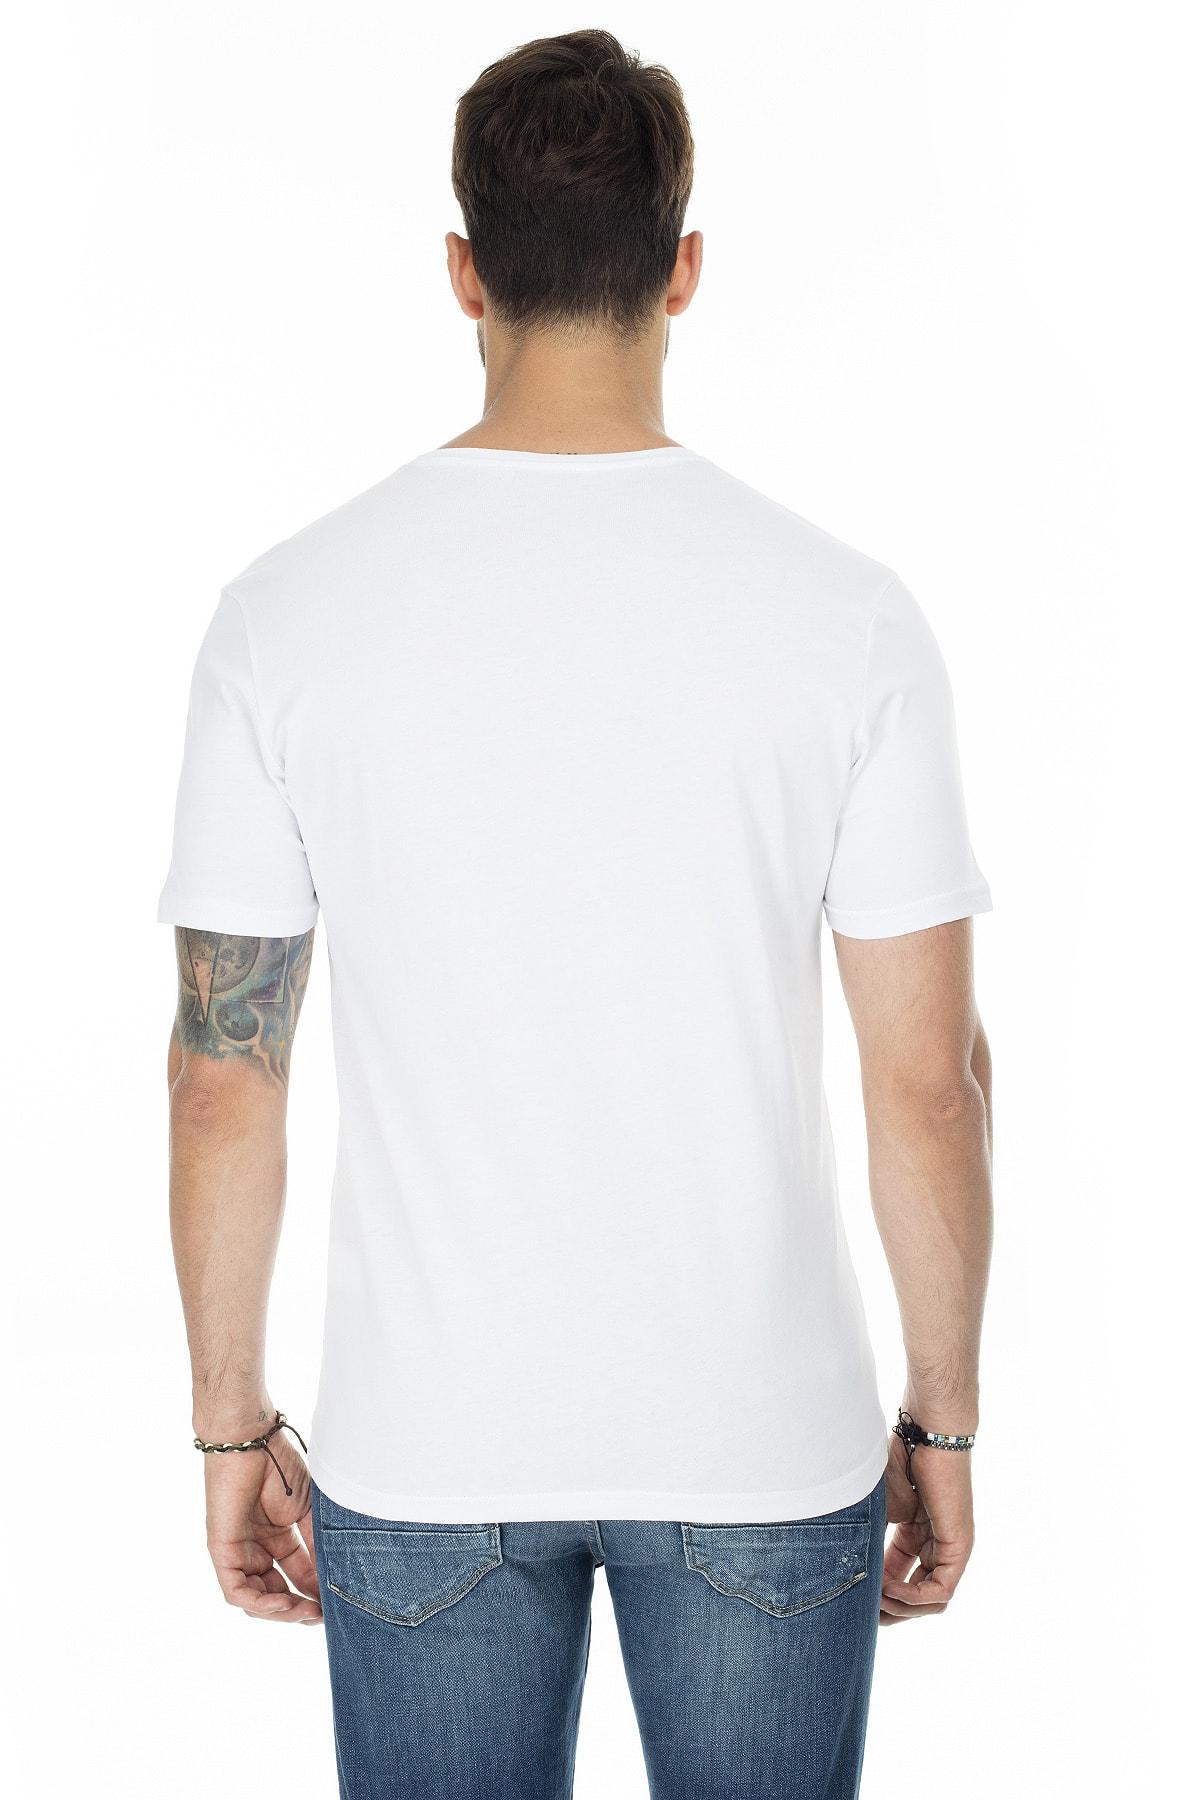 Buratti Erkek BEYAZ-BEYAZ 2'li Paket V Yaka Slim Fit Pamuklu Basic T Shirt 5722512V2 2